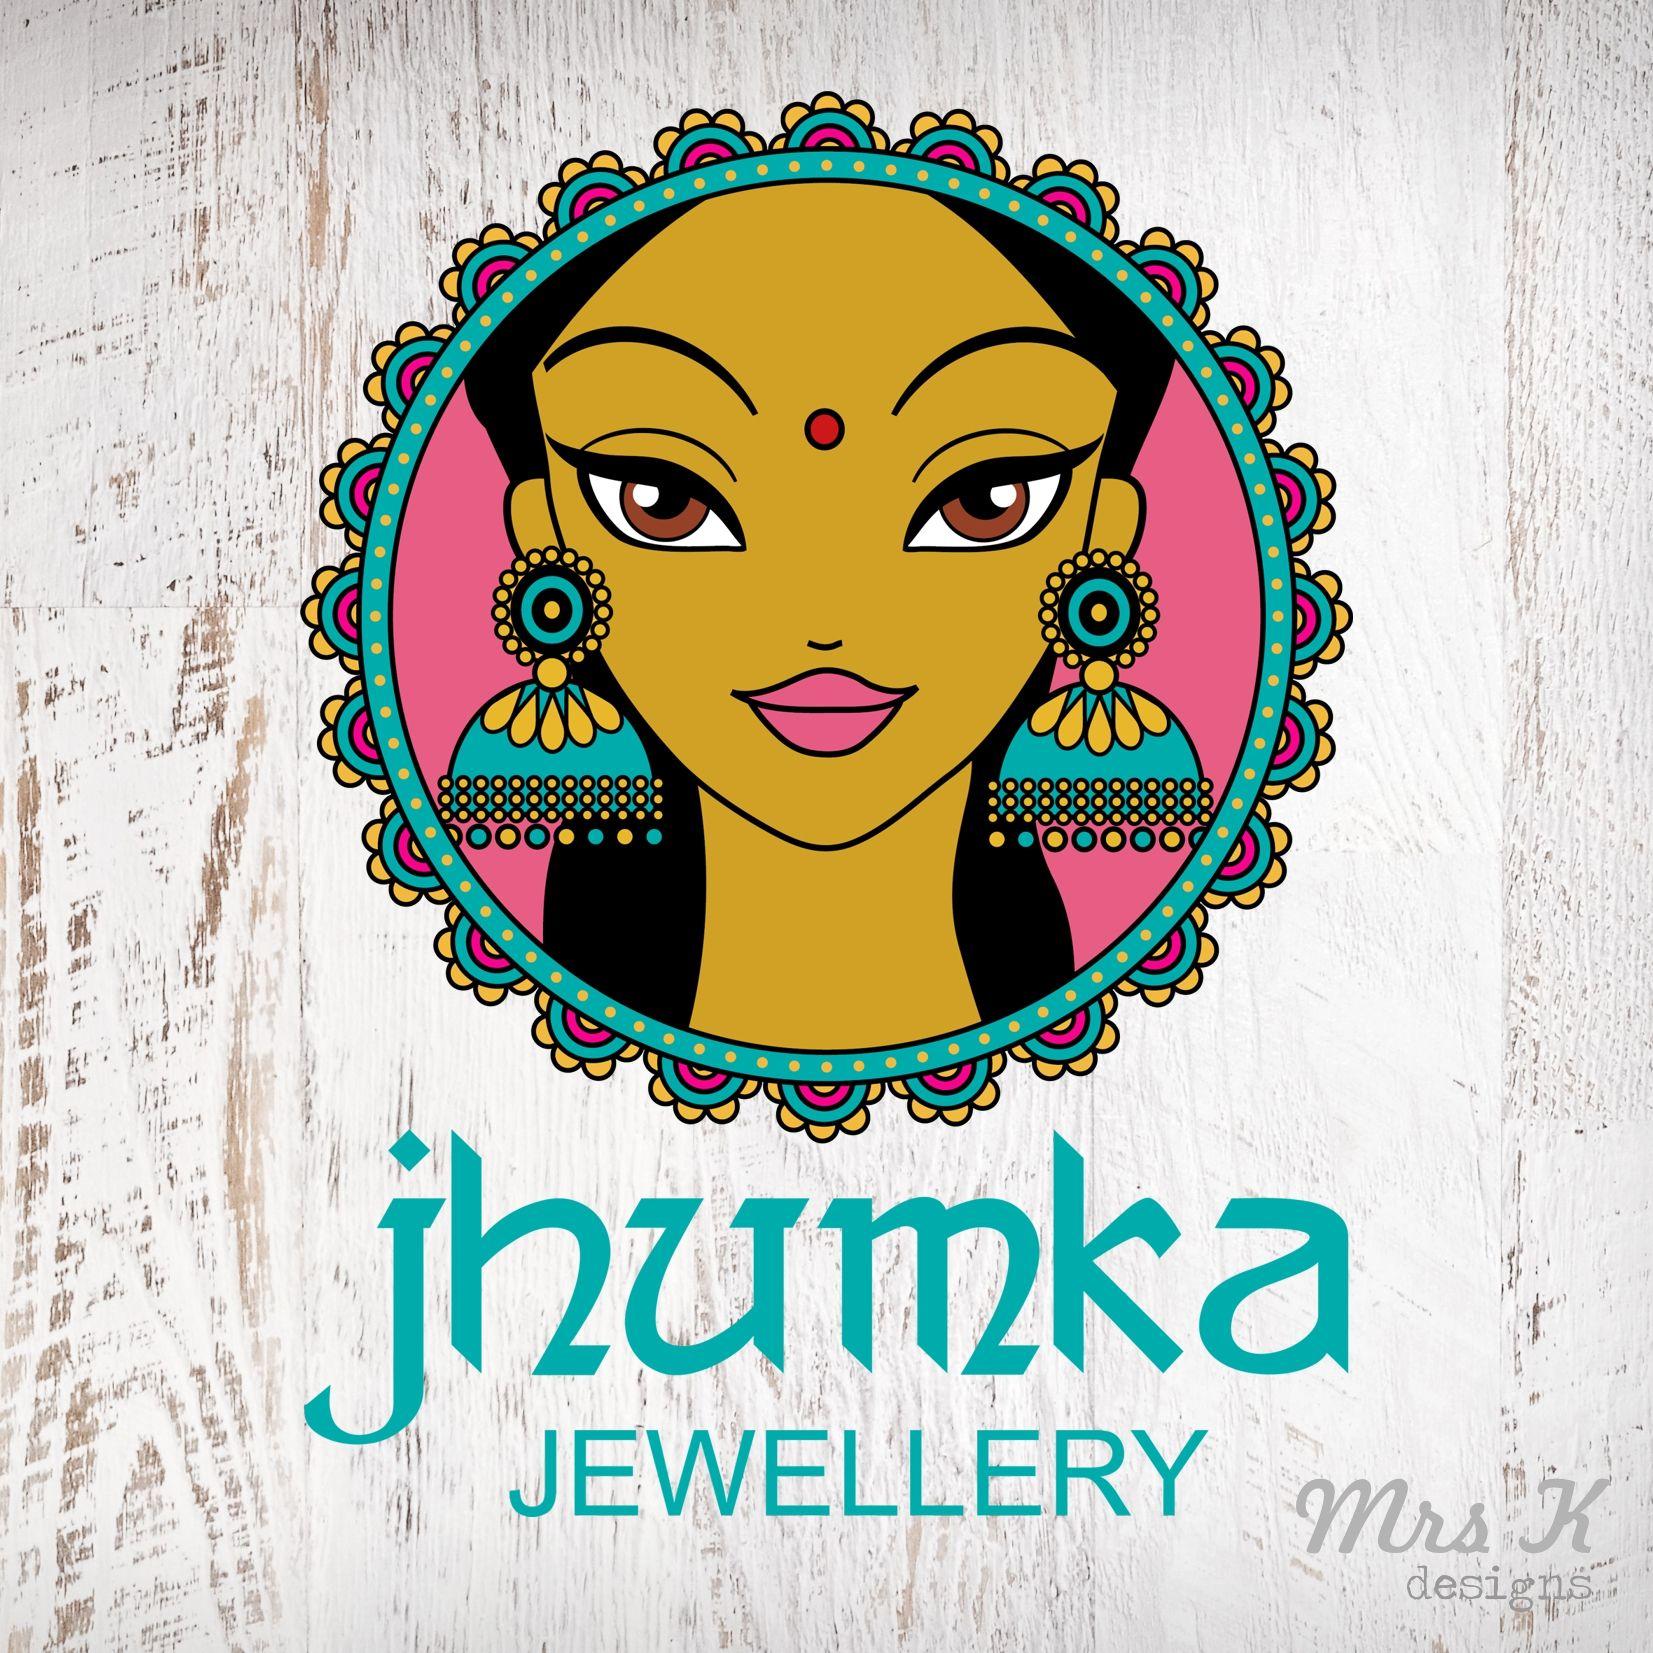 Logos - Jhumka Jewellery